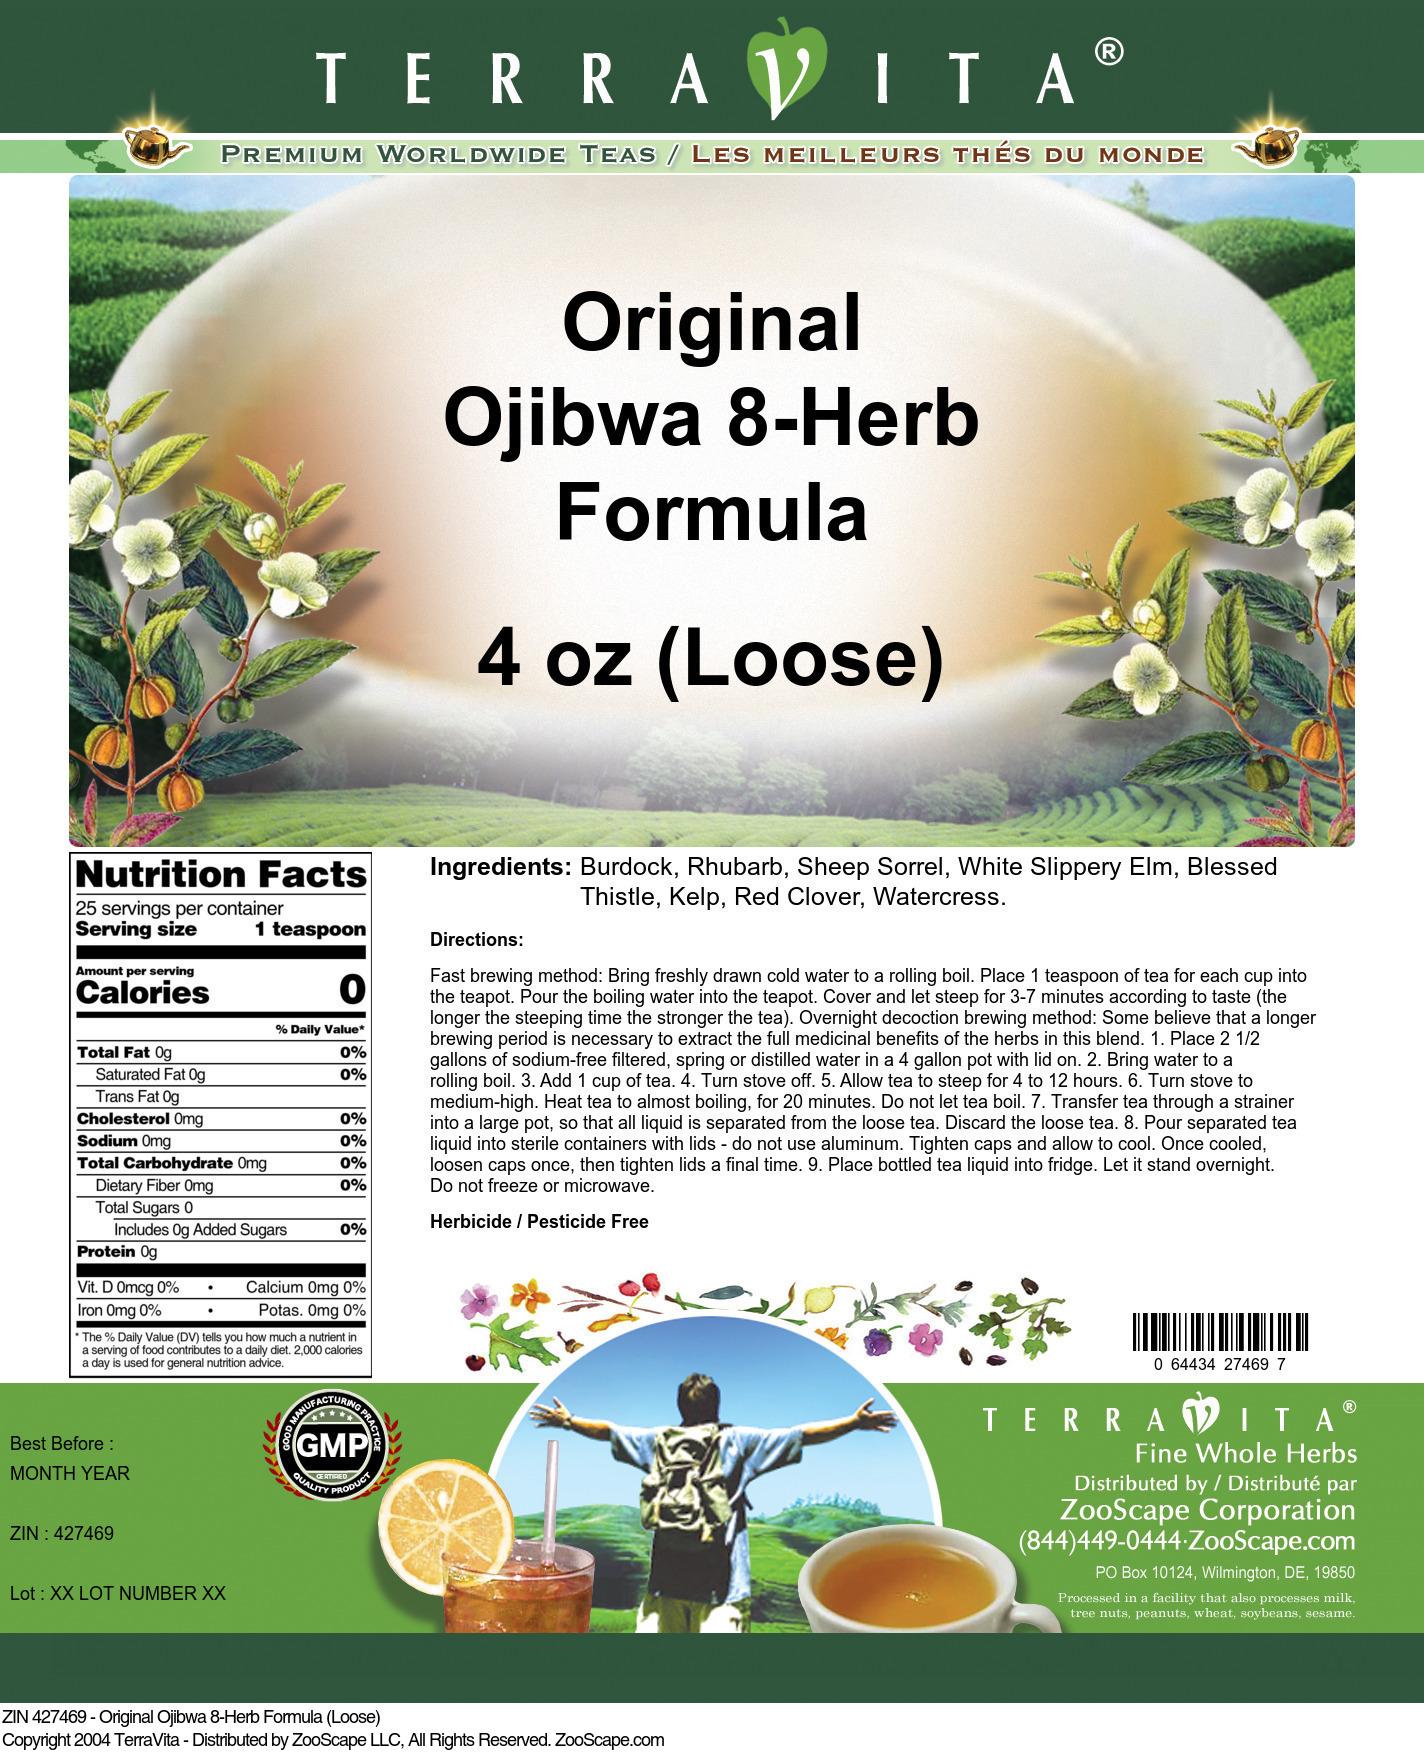 Original Ojibwa 8-Herb Formula (Loose)